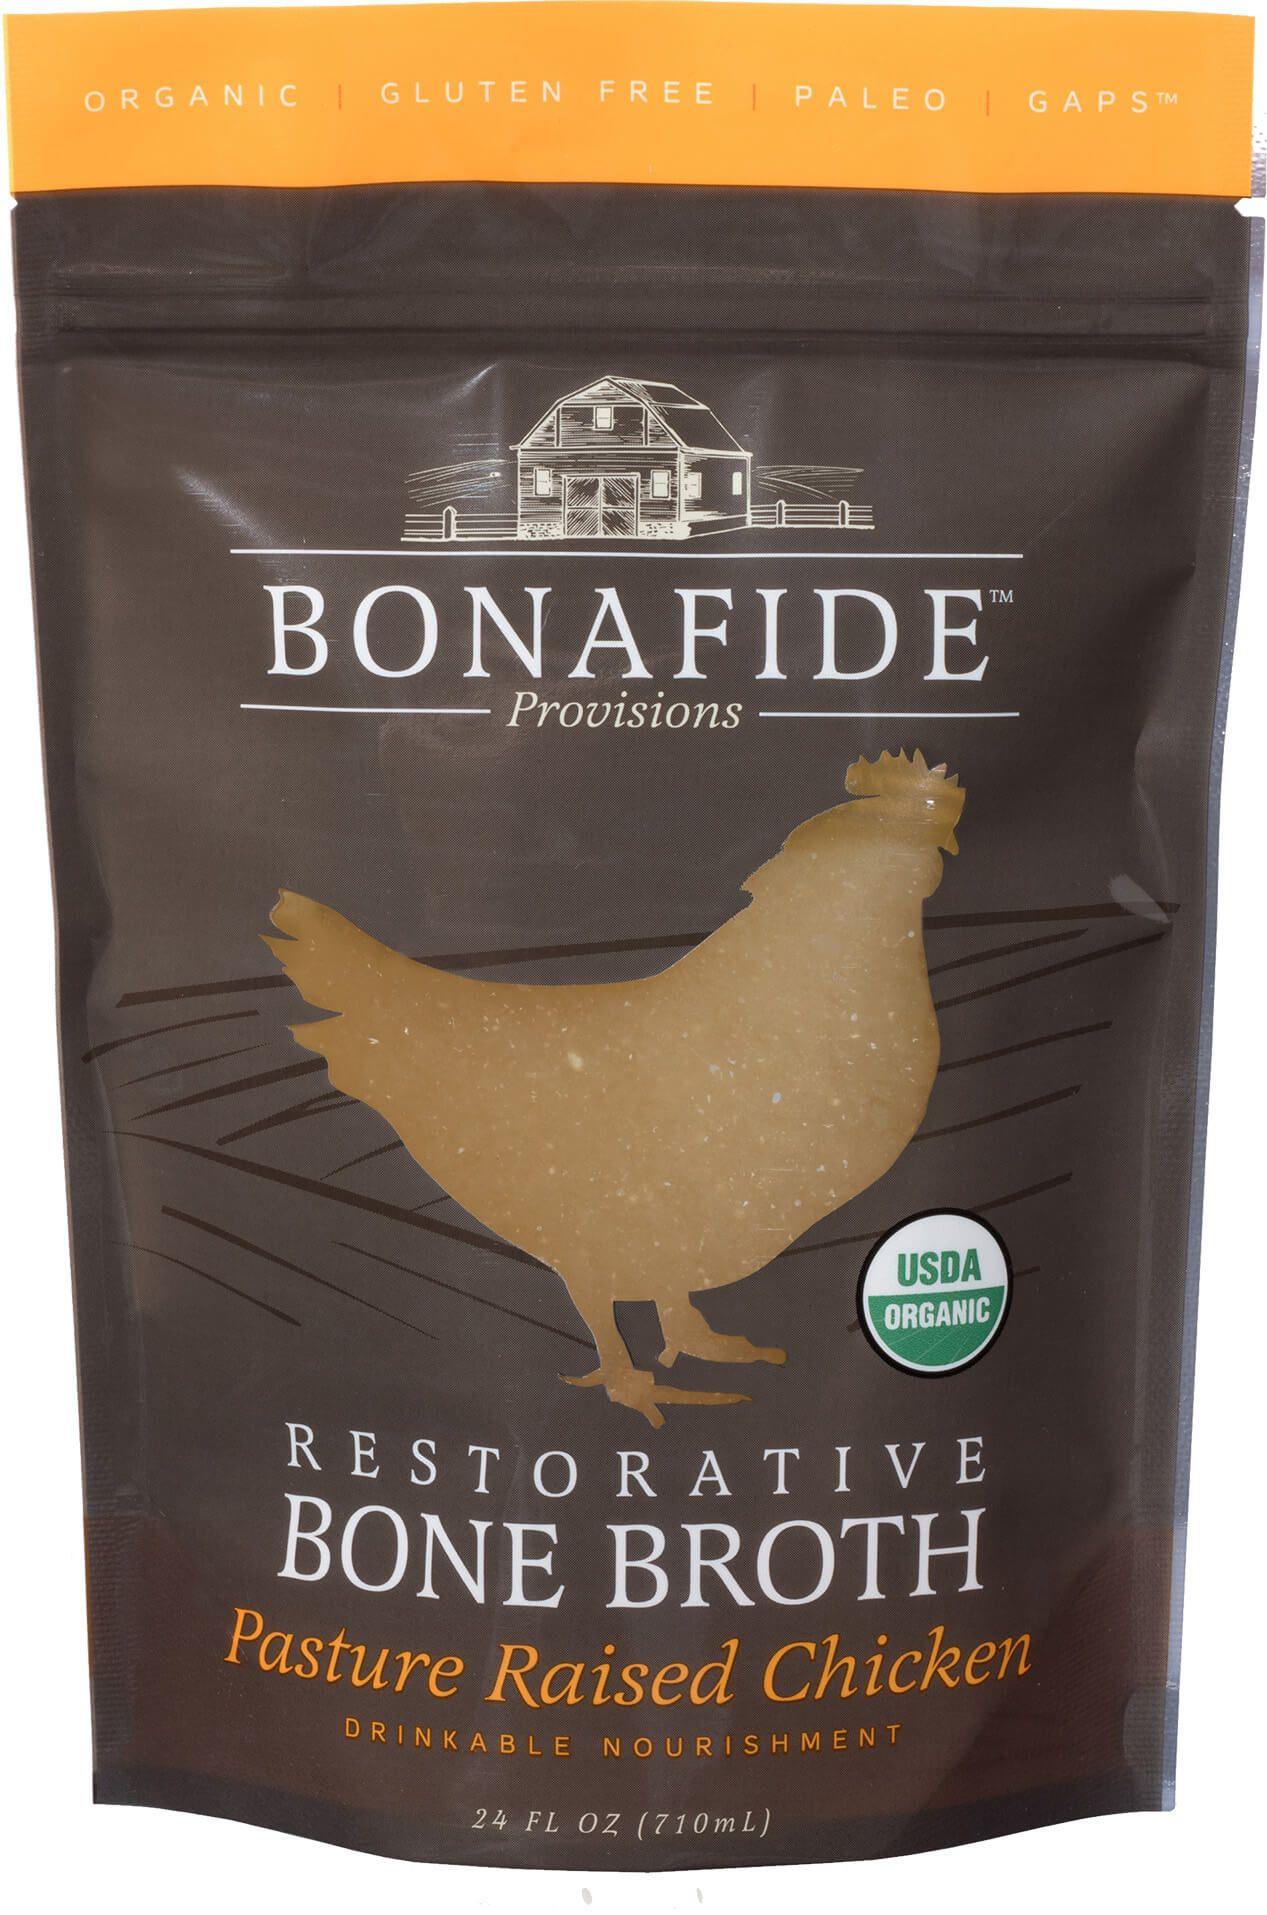 Bonafide Provisions | Whole30 Approved Restorative Bone Broth